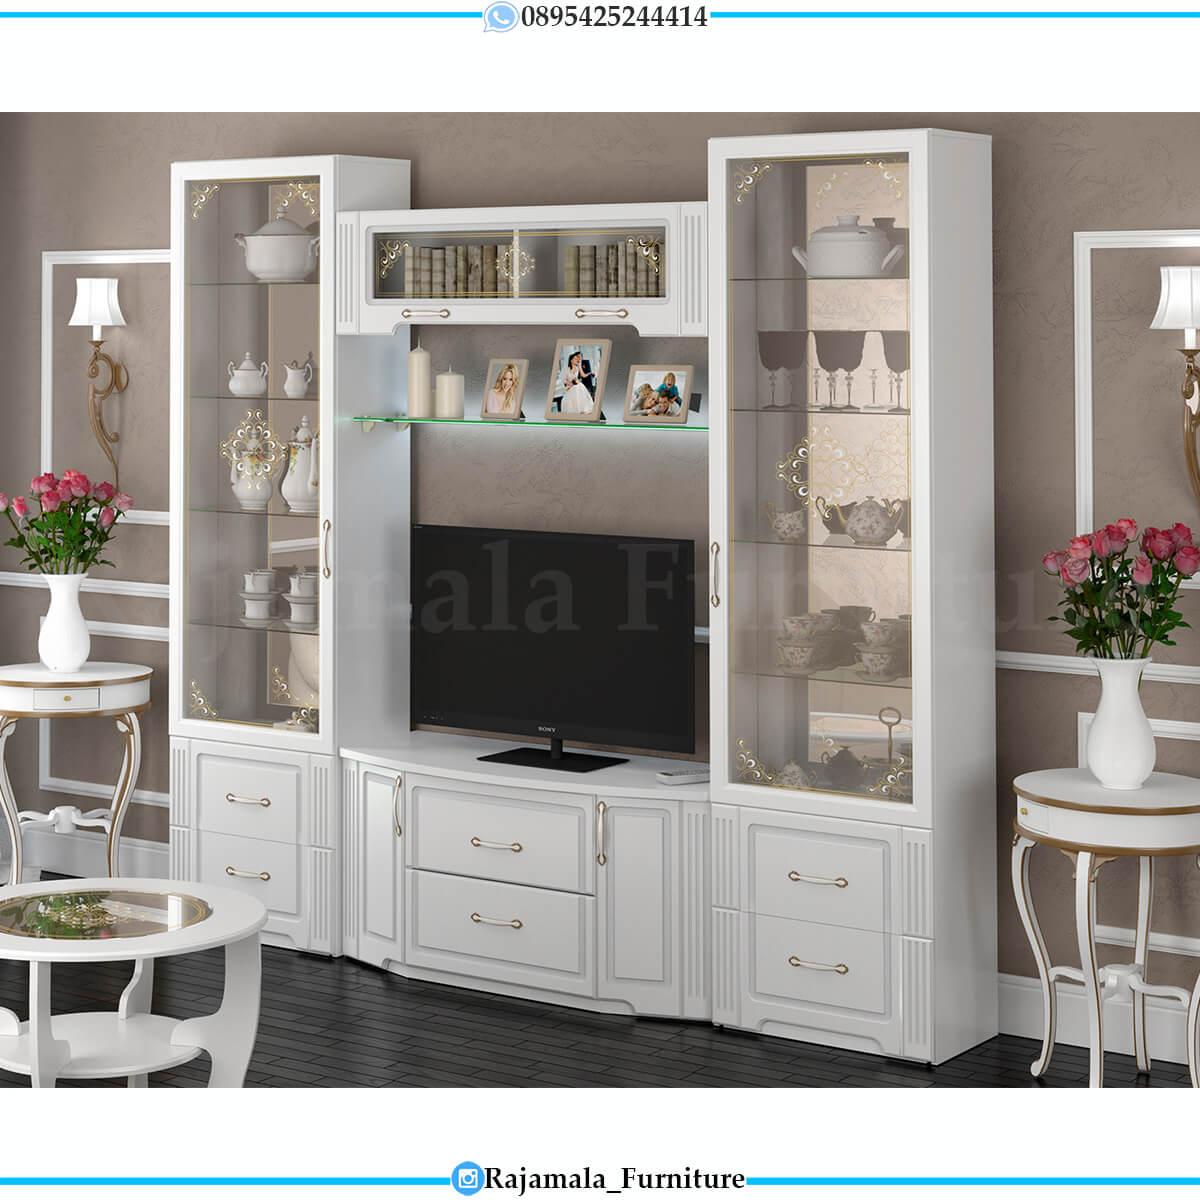 Bufet TV Mewah Minimalis Putih Elegant Color Glossy Luxury RM-0660